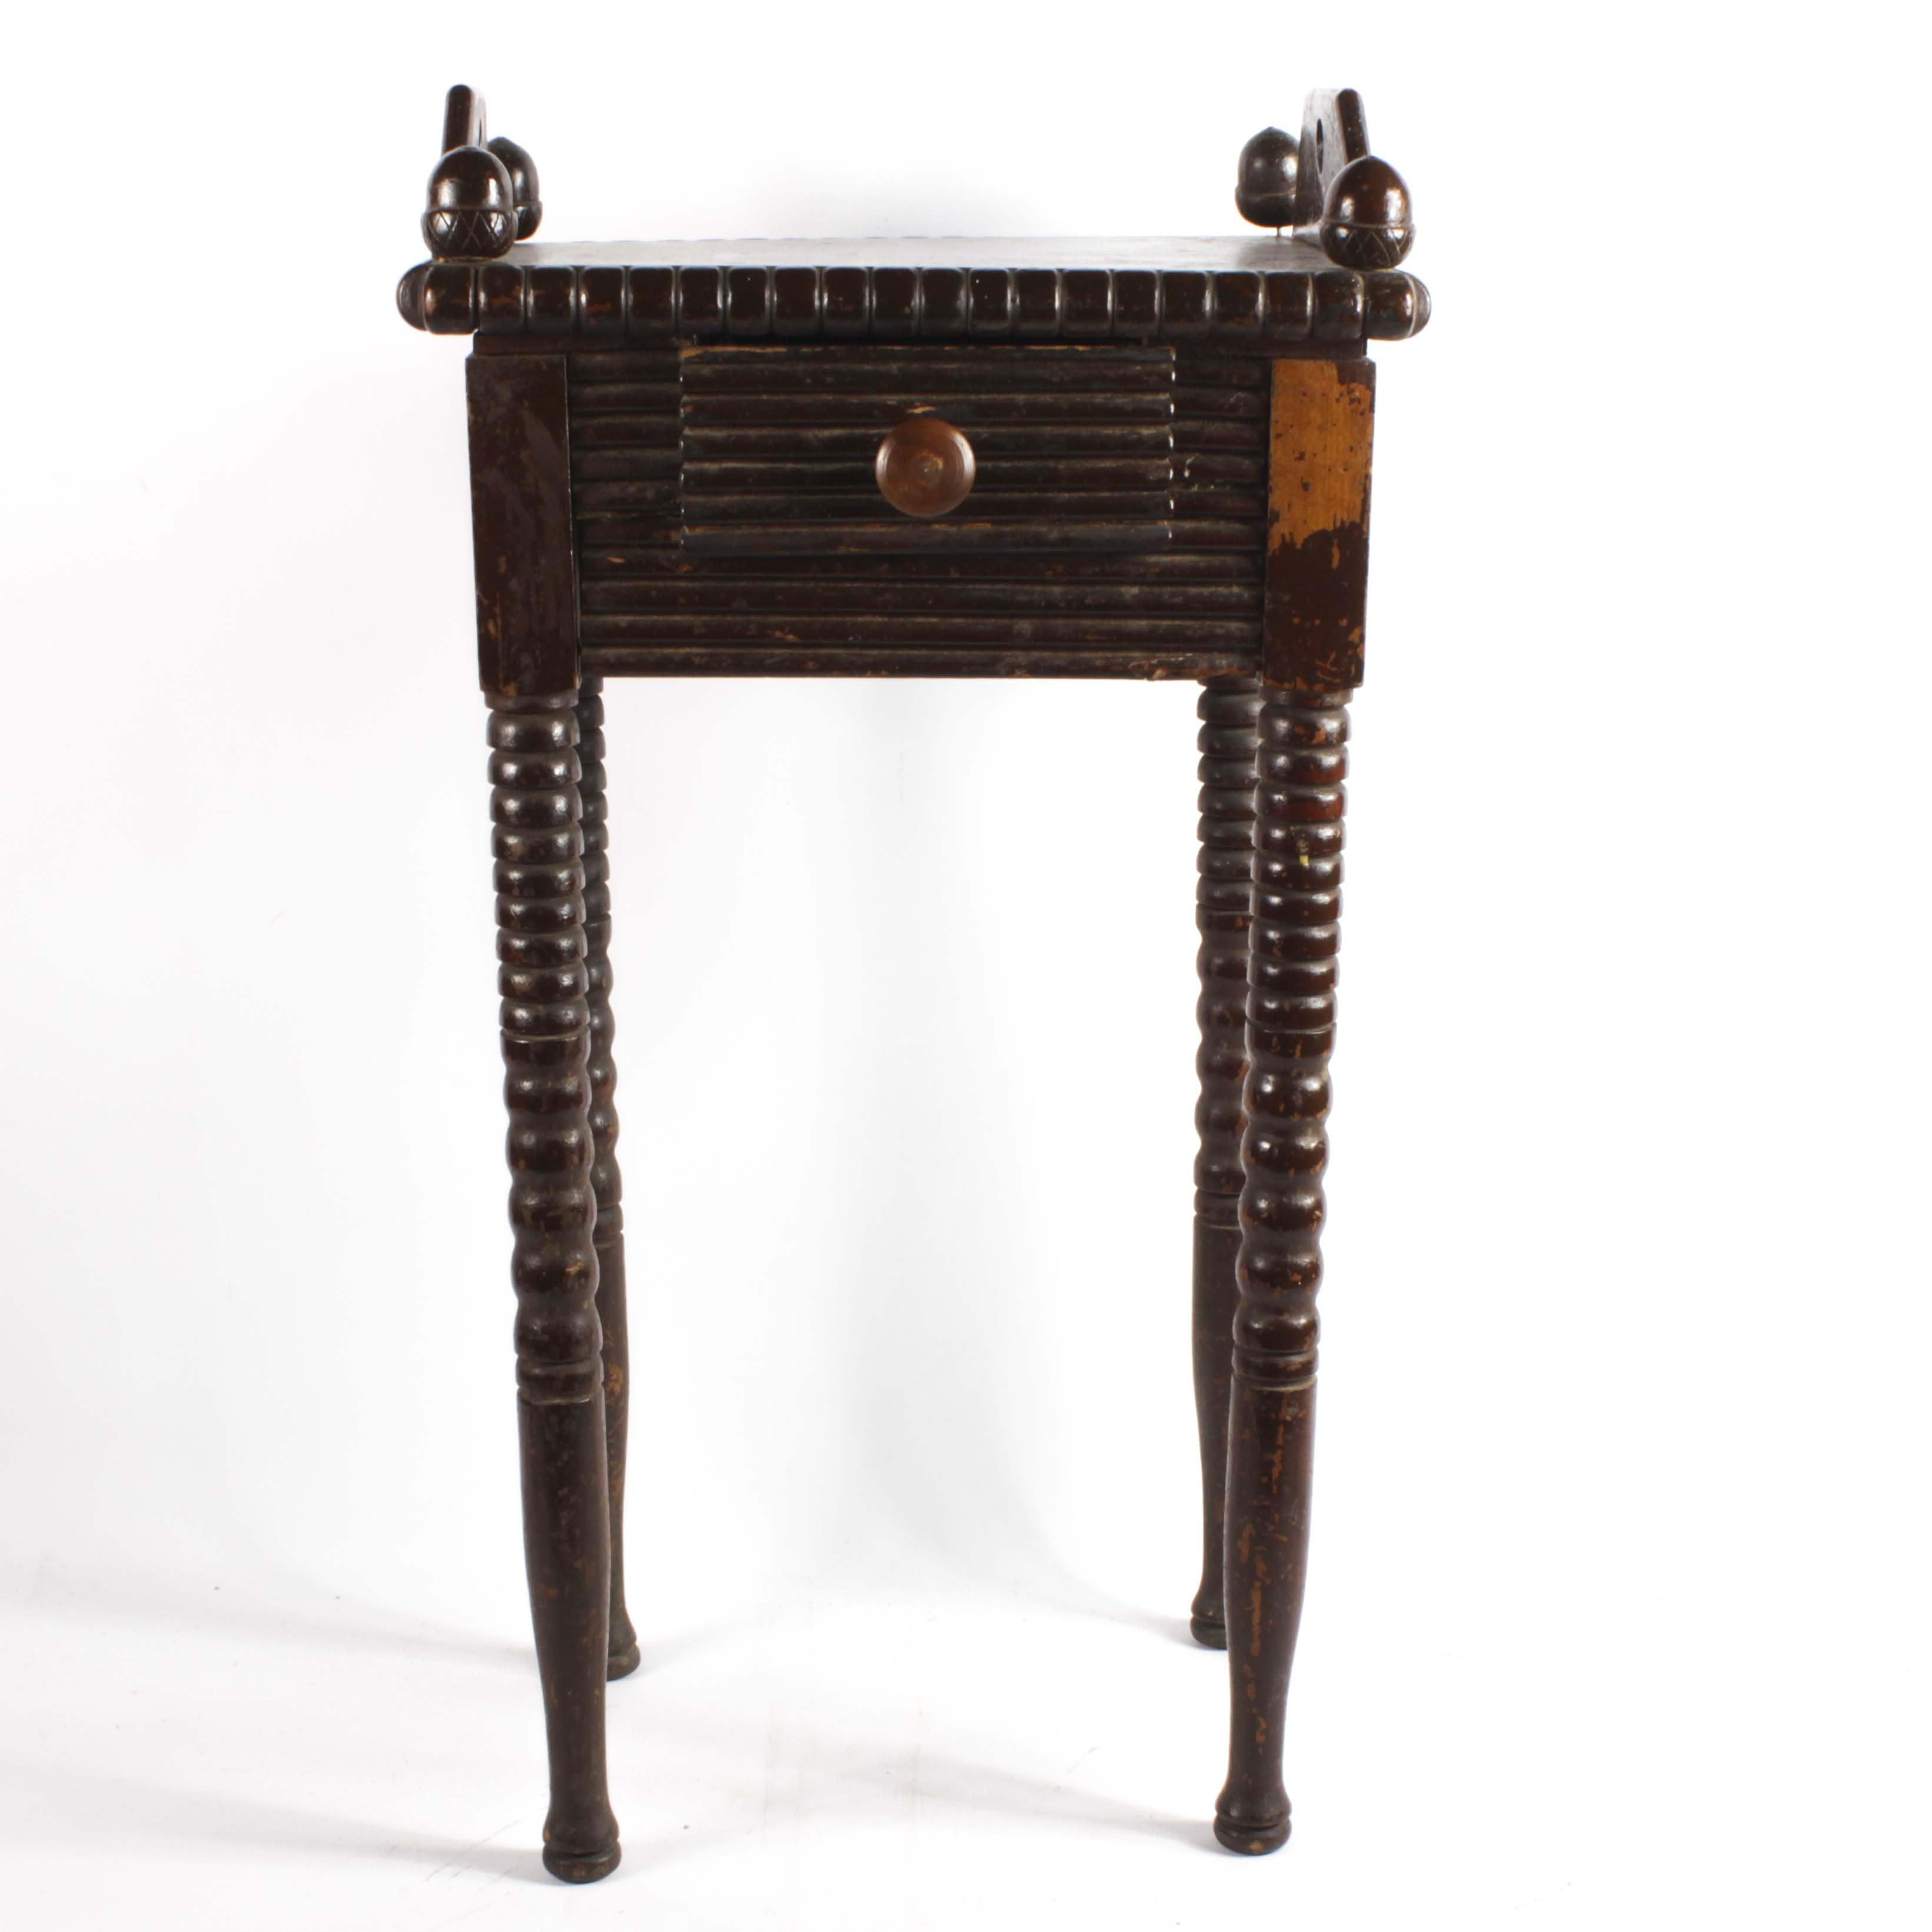 Rustic Walnut Finish Smoking Table, Early 20th Century